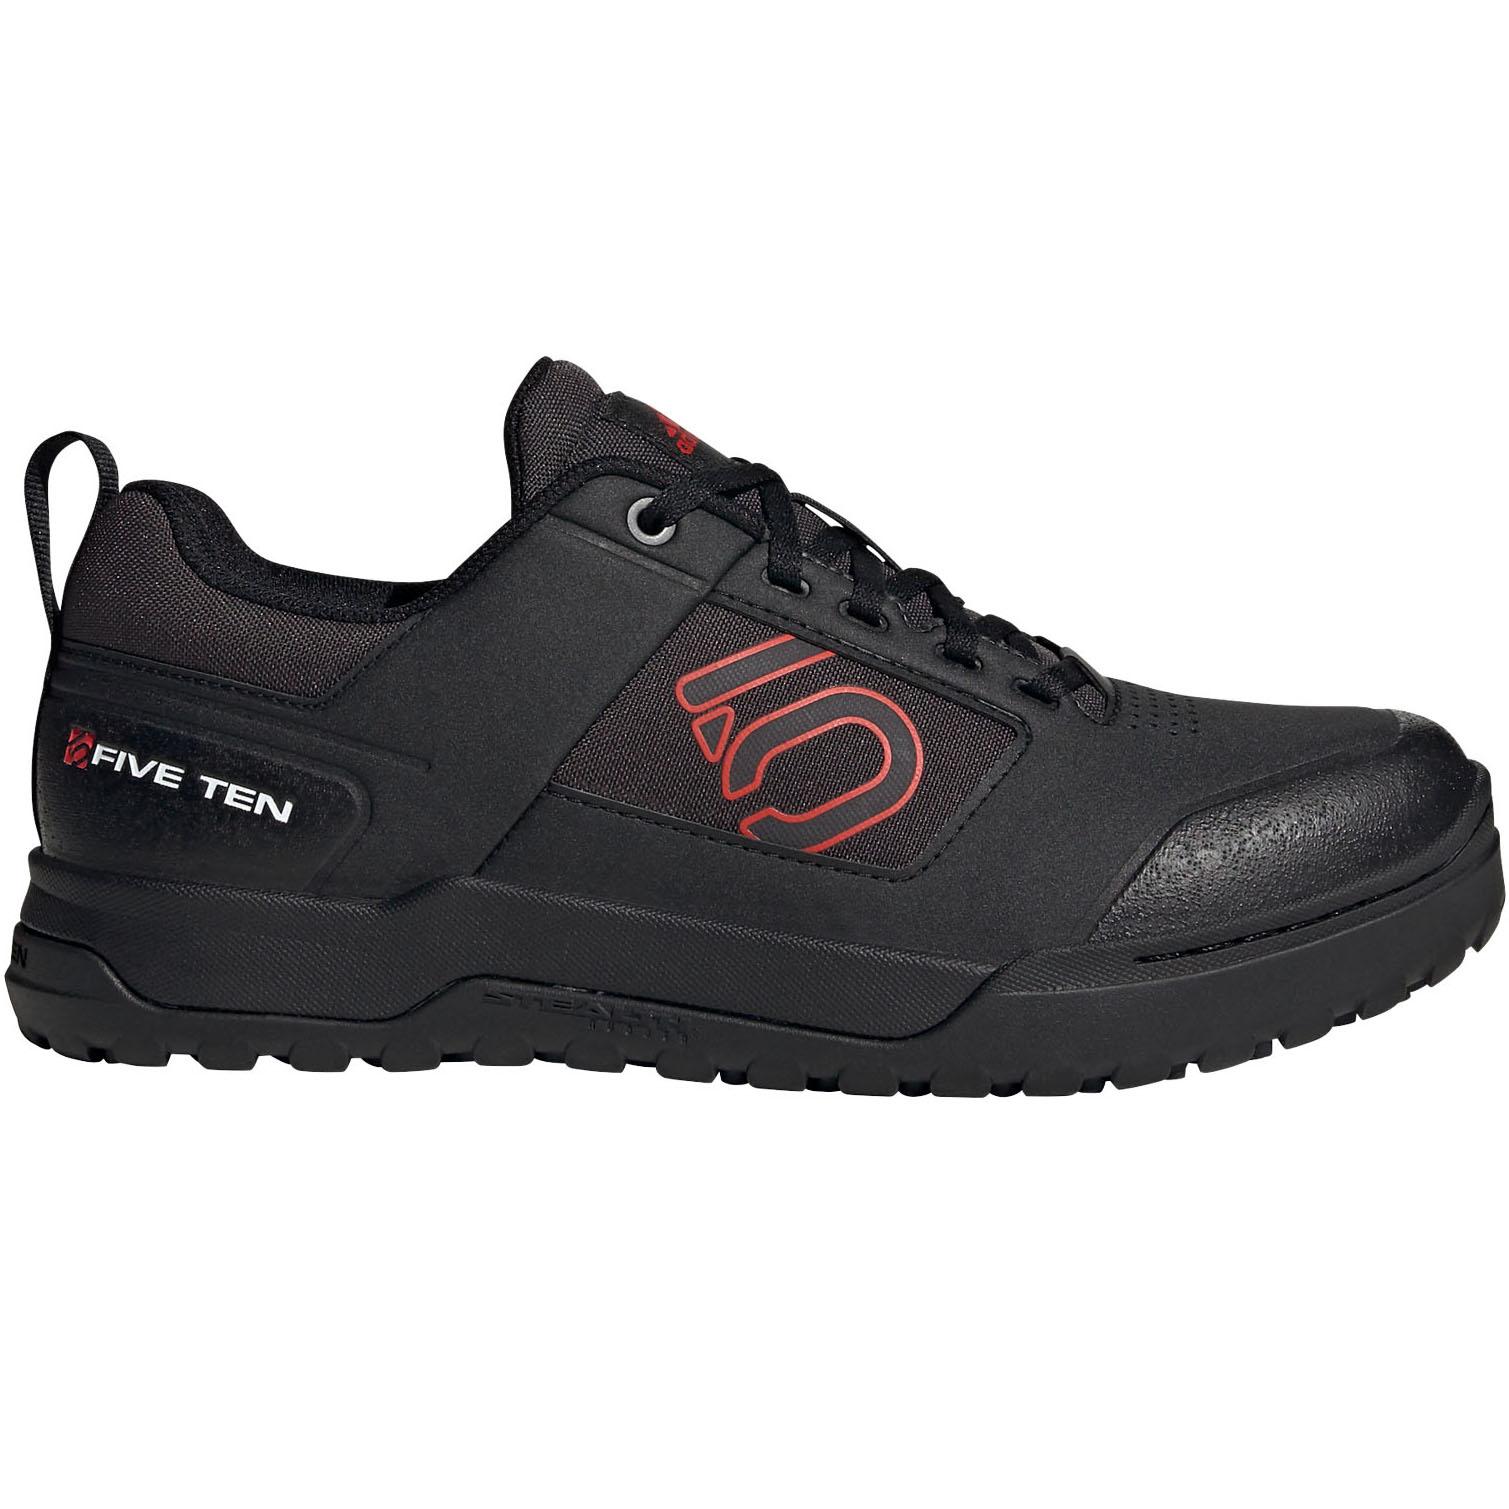 Foto de Five Ten Impact Pro MTB Zapatillas de bicicleta - core black/red